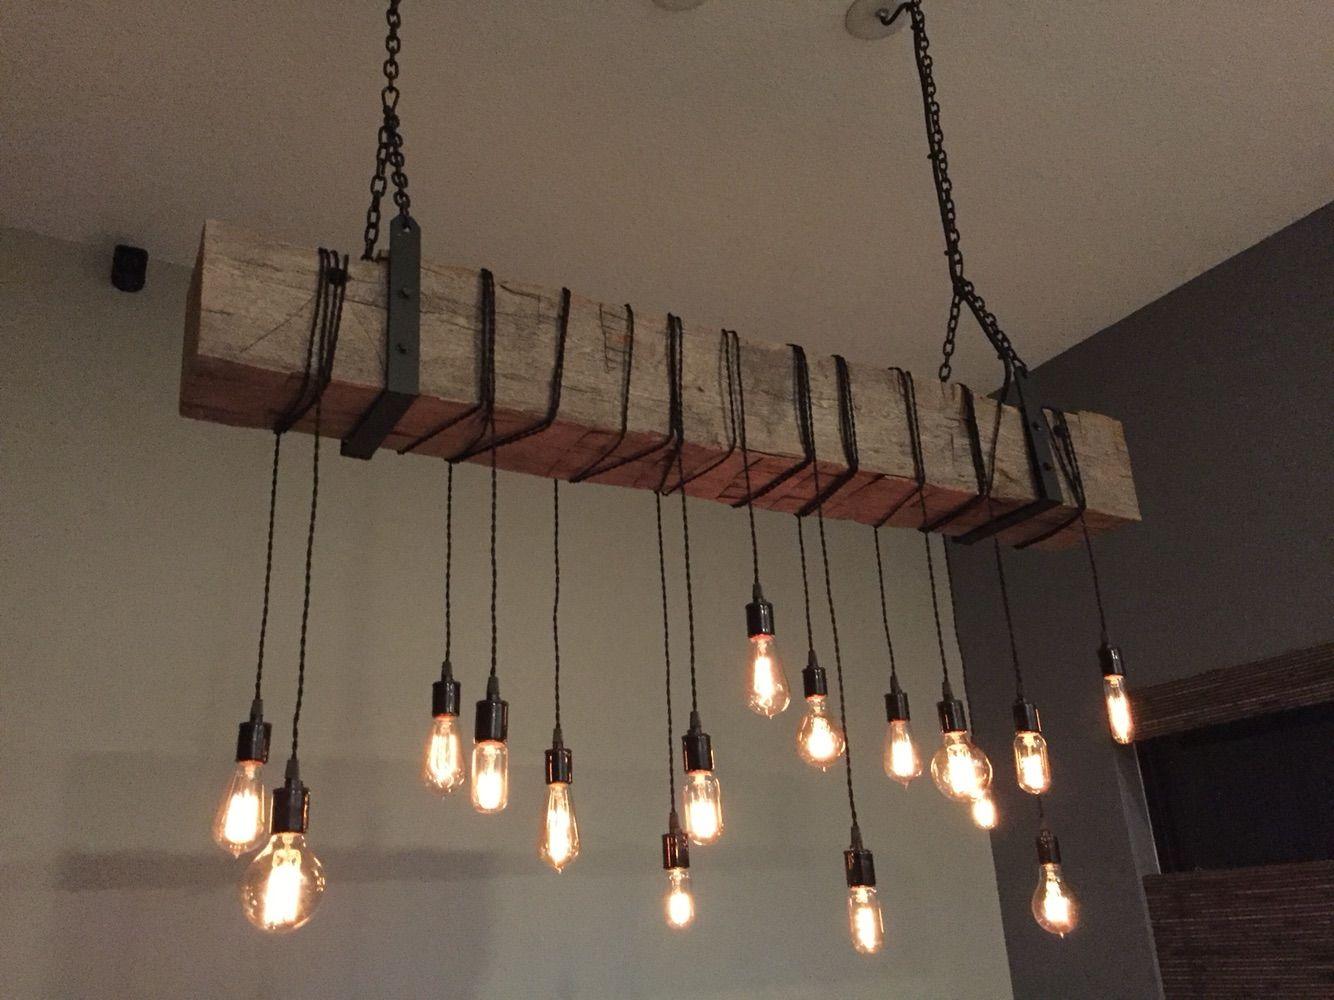 custom made reclaimed barn beam chandelier light fixture modern industrial rustic lighting chandelier barn board